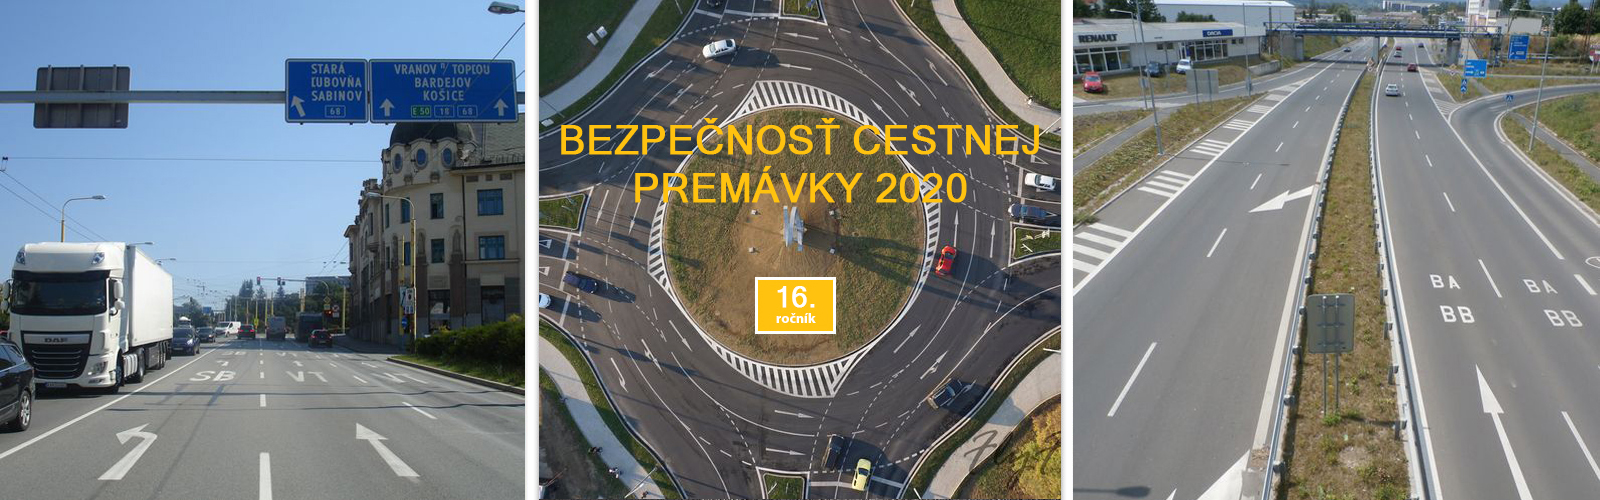 becep 2020